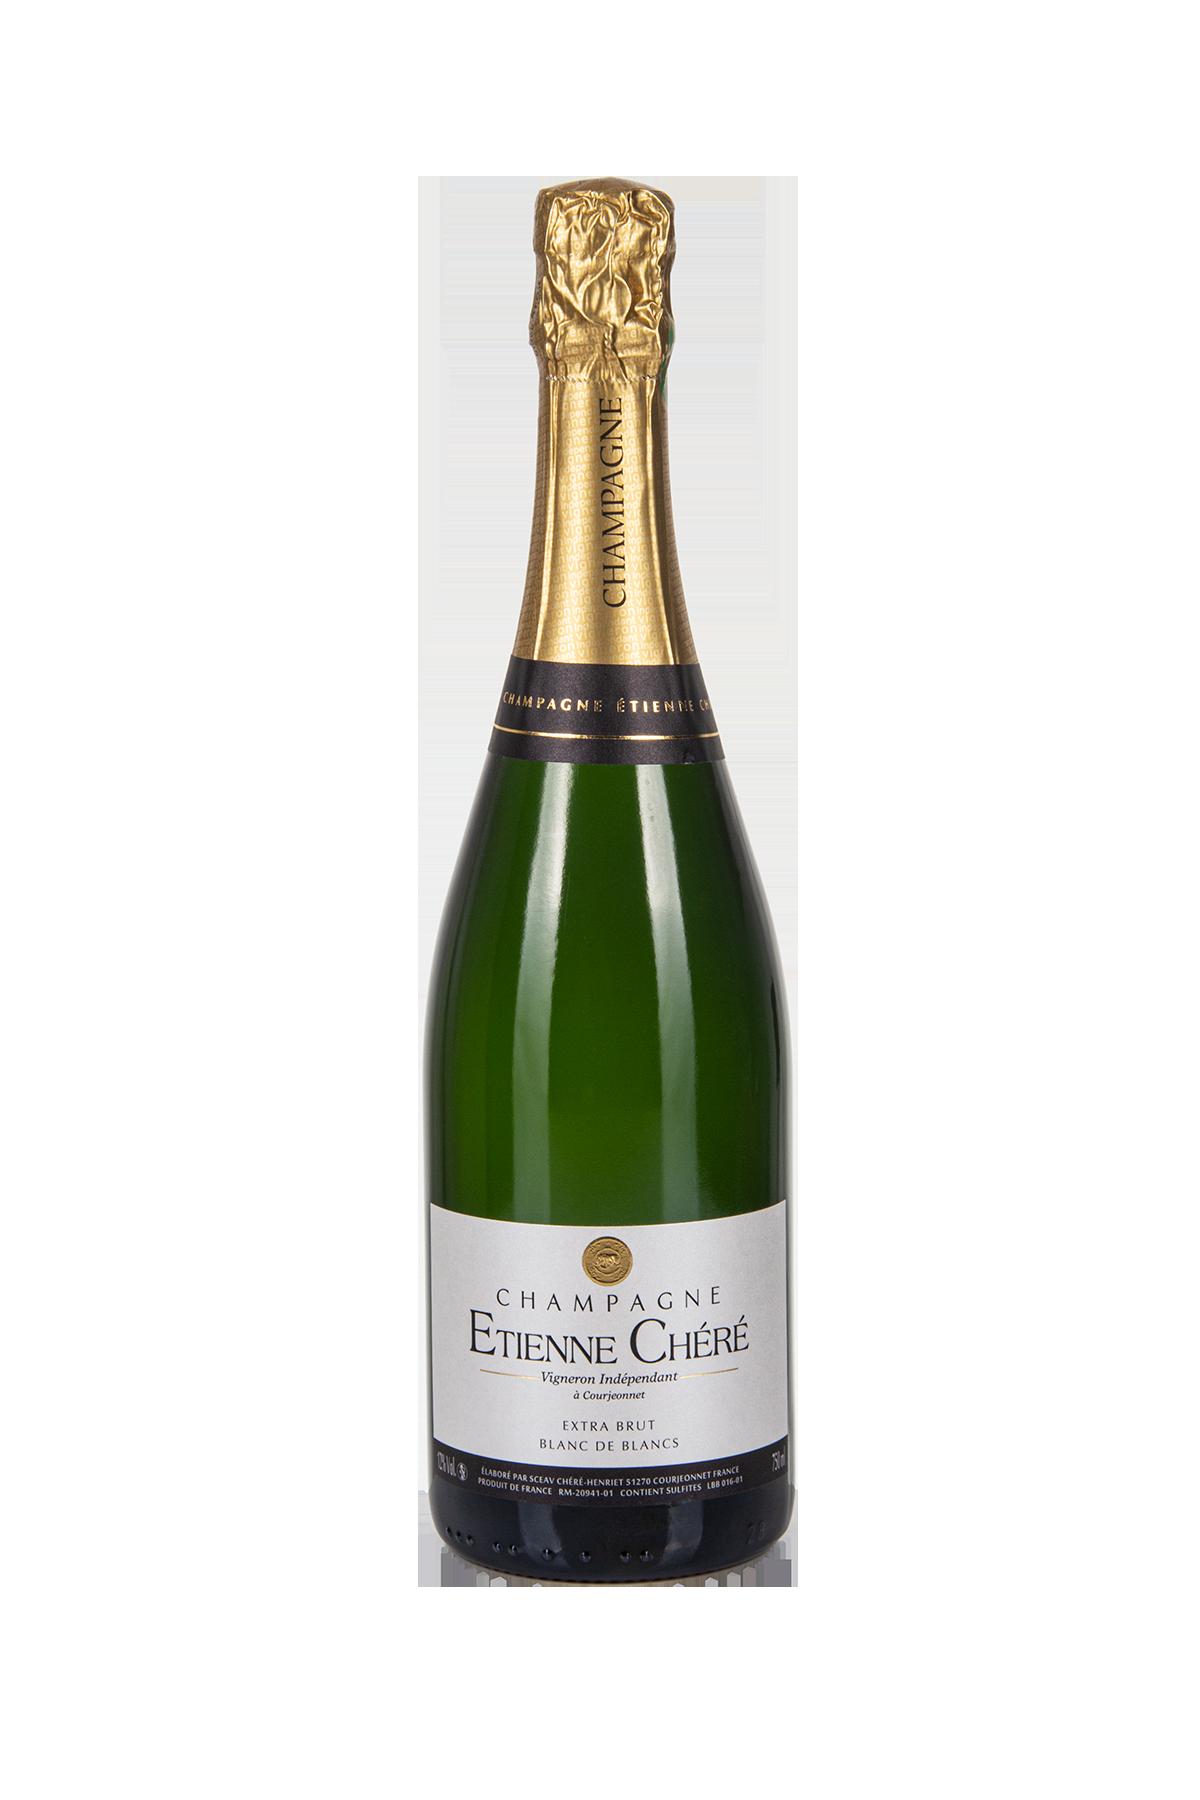 Das Bild zeigt die Flasche Champagne AOC Extra Brut Blanc de Blancs Etienne Chéré